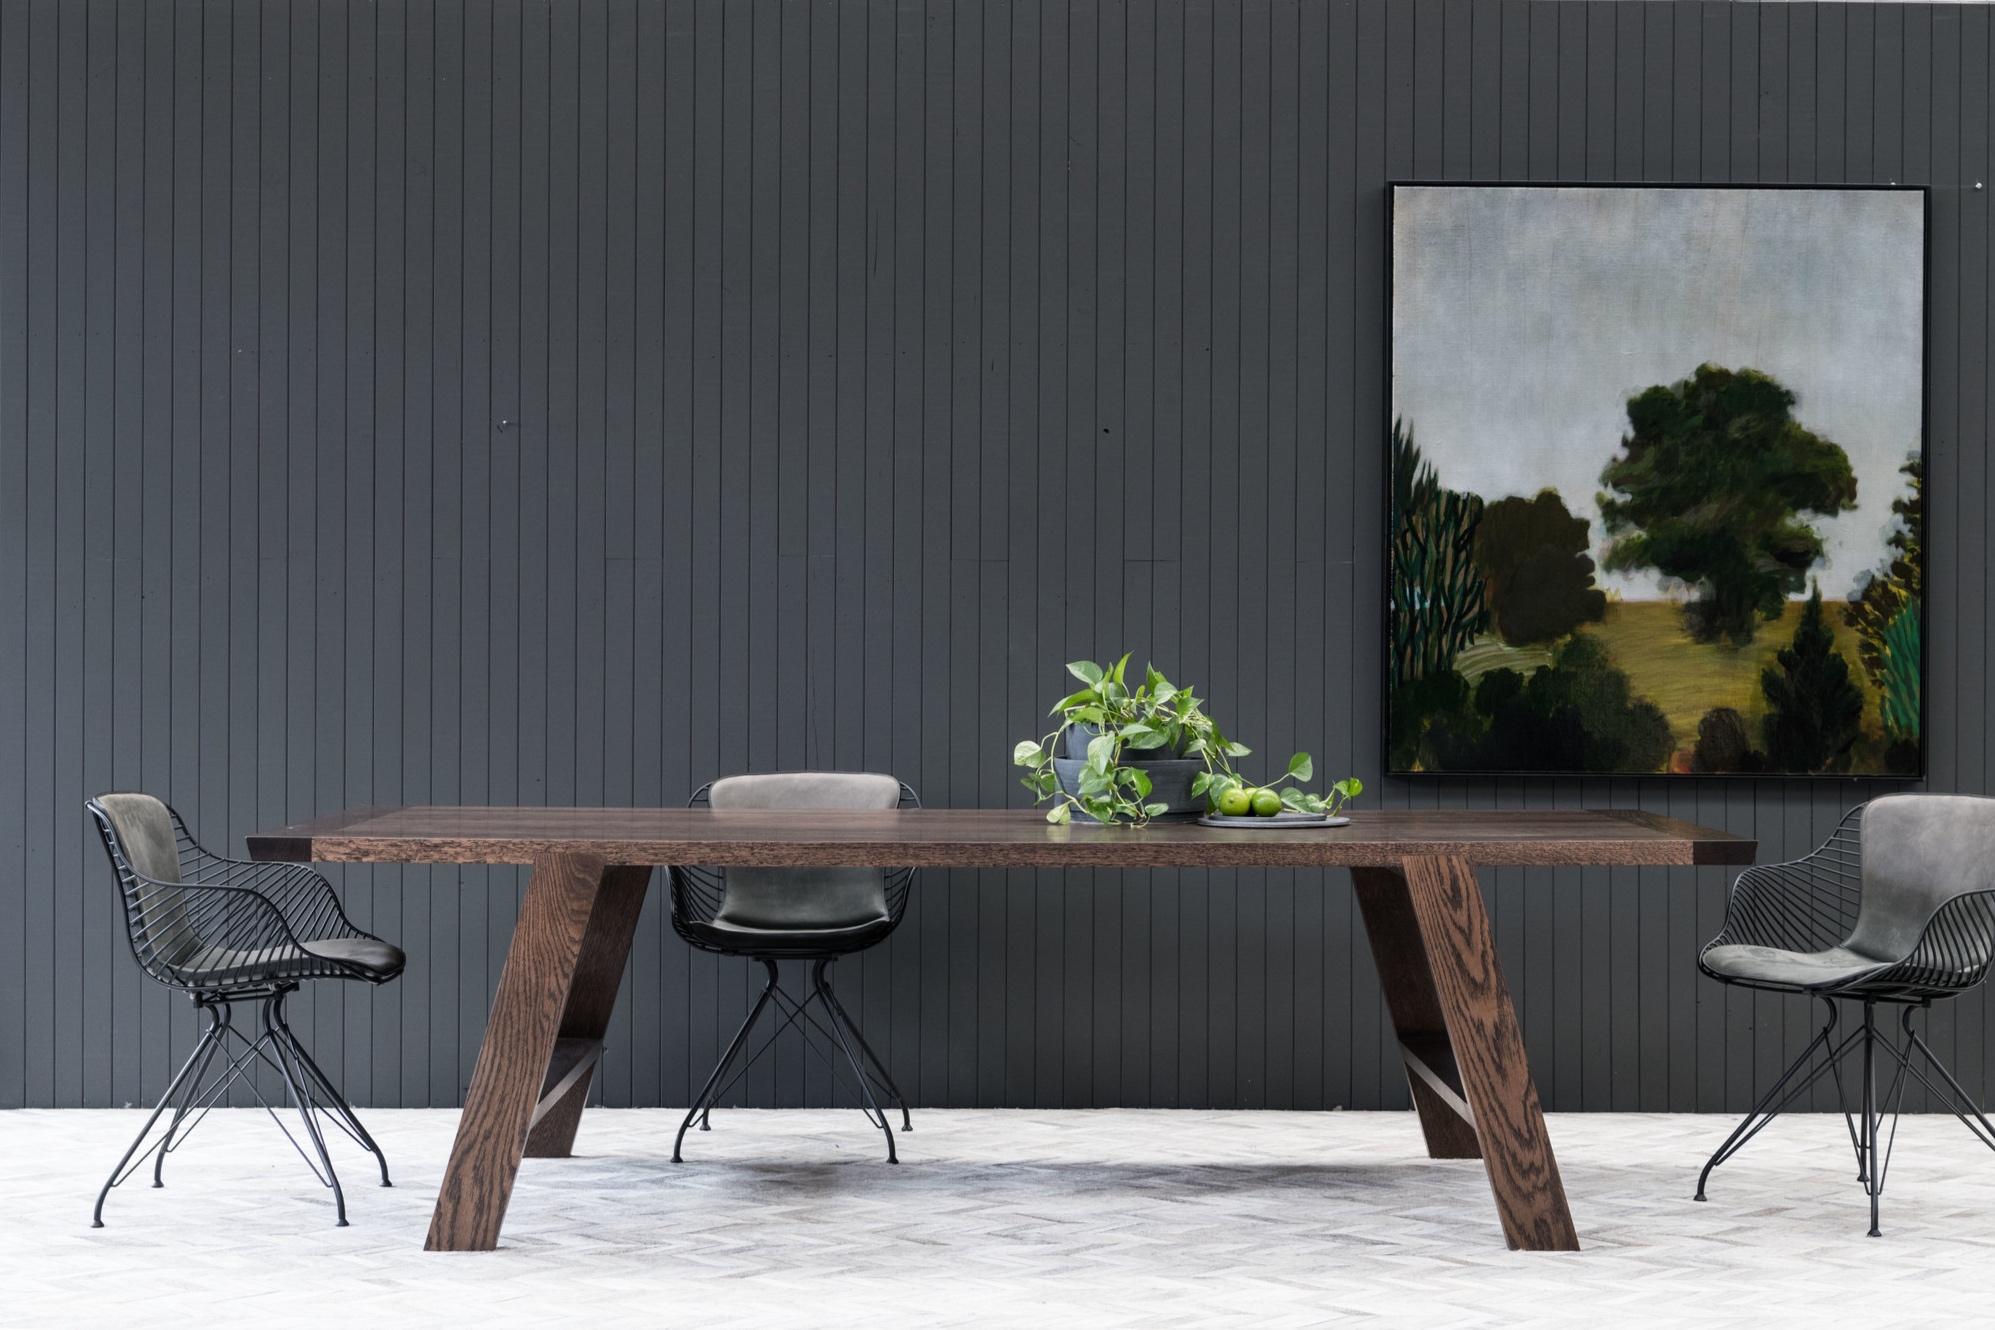 The Hemingway Table